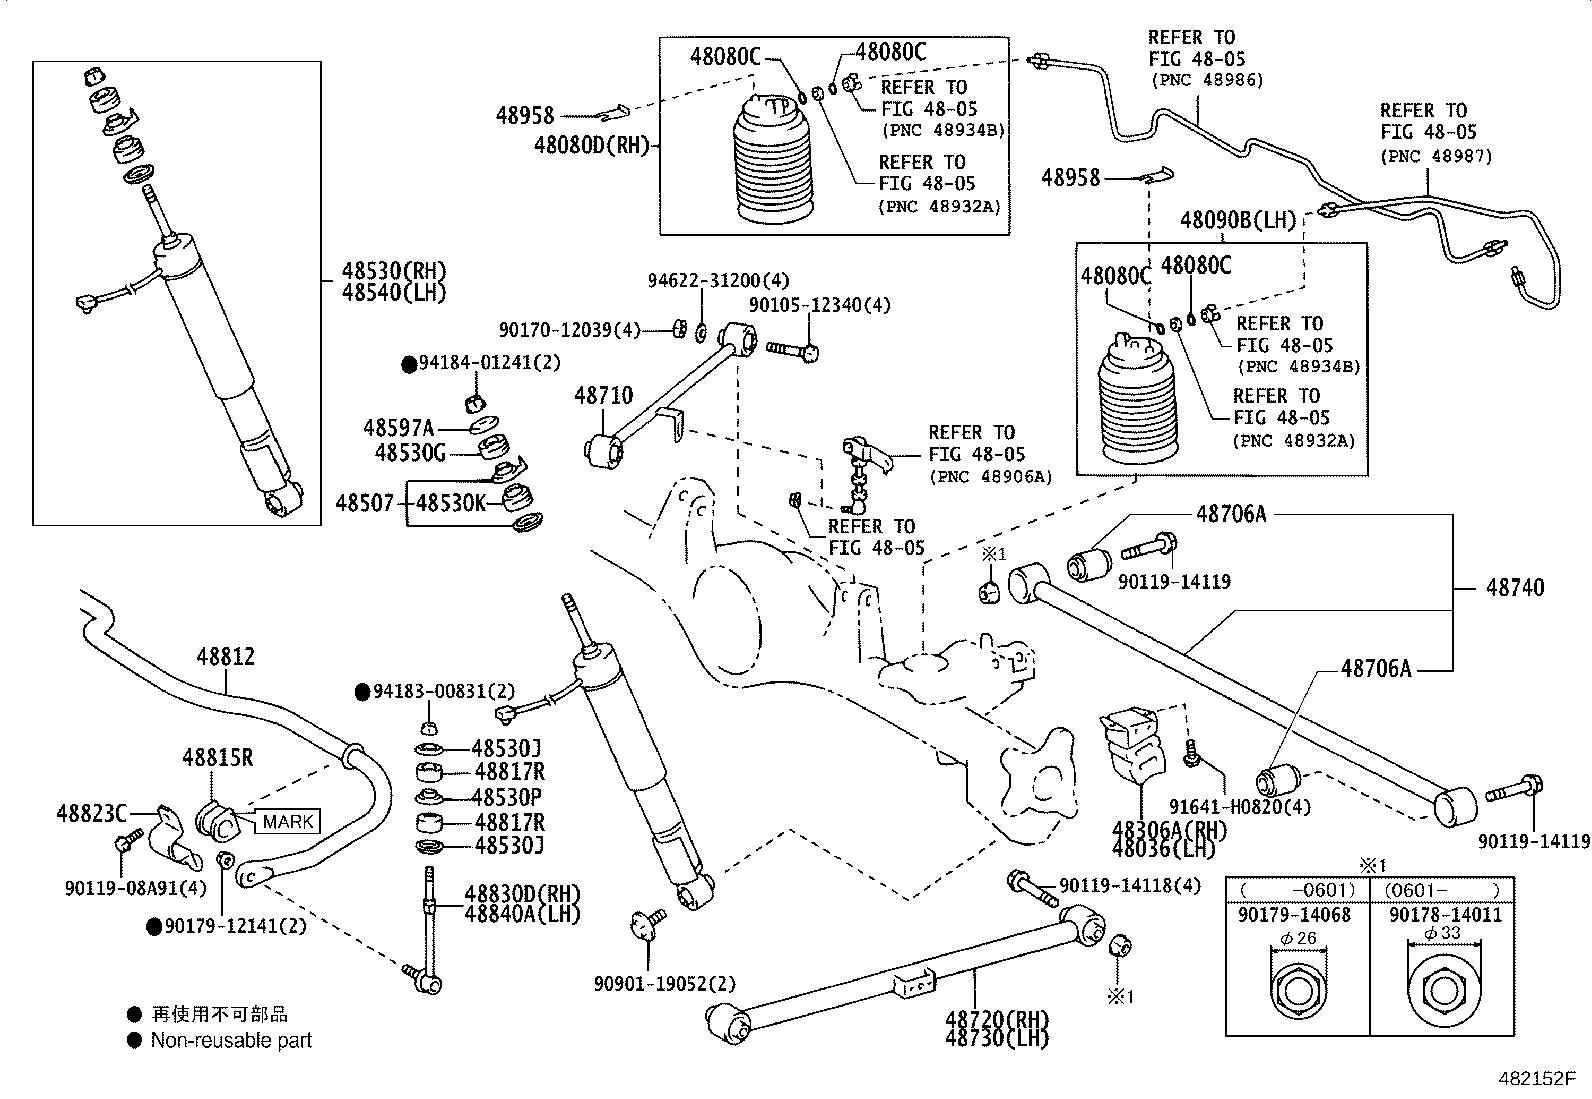 1990 Lexus Link assembly. Rear stabilizer; rear stabilizer